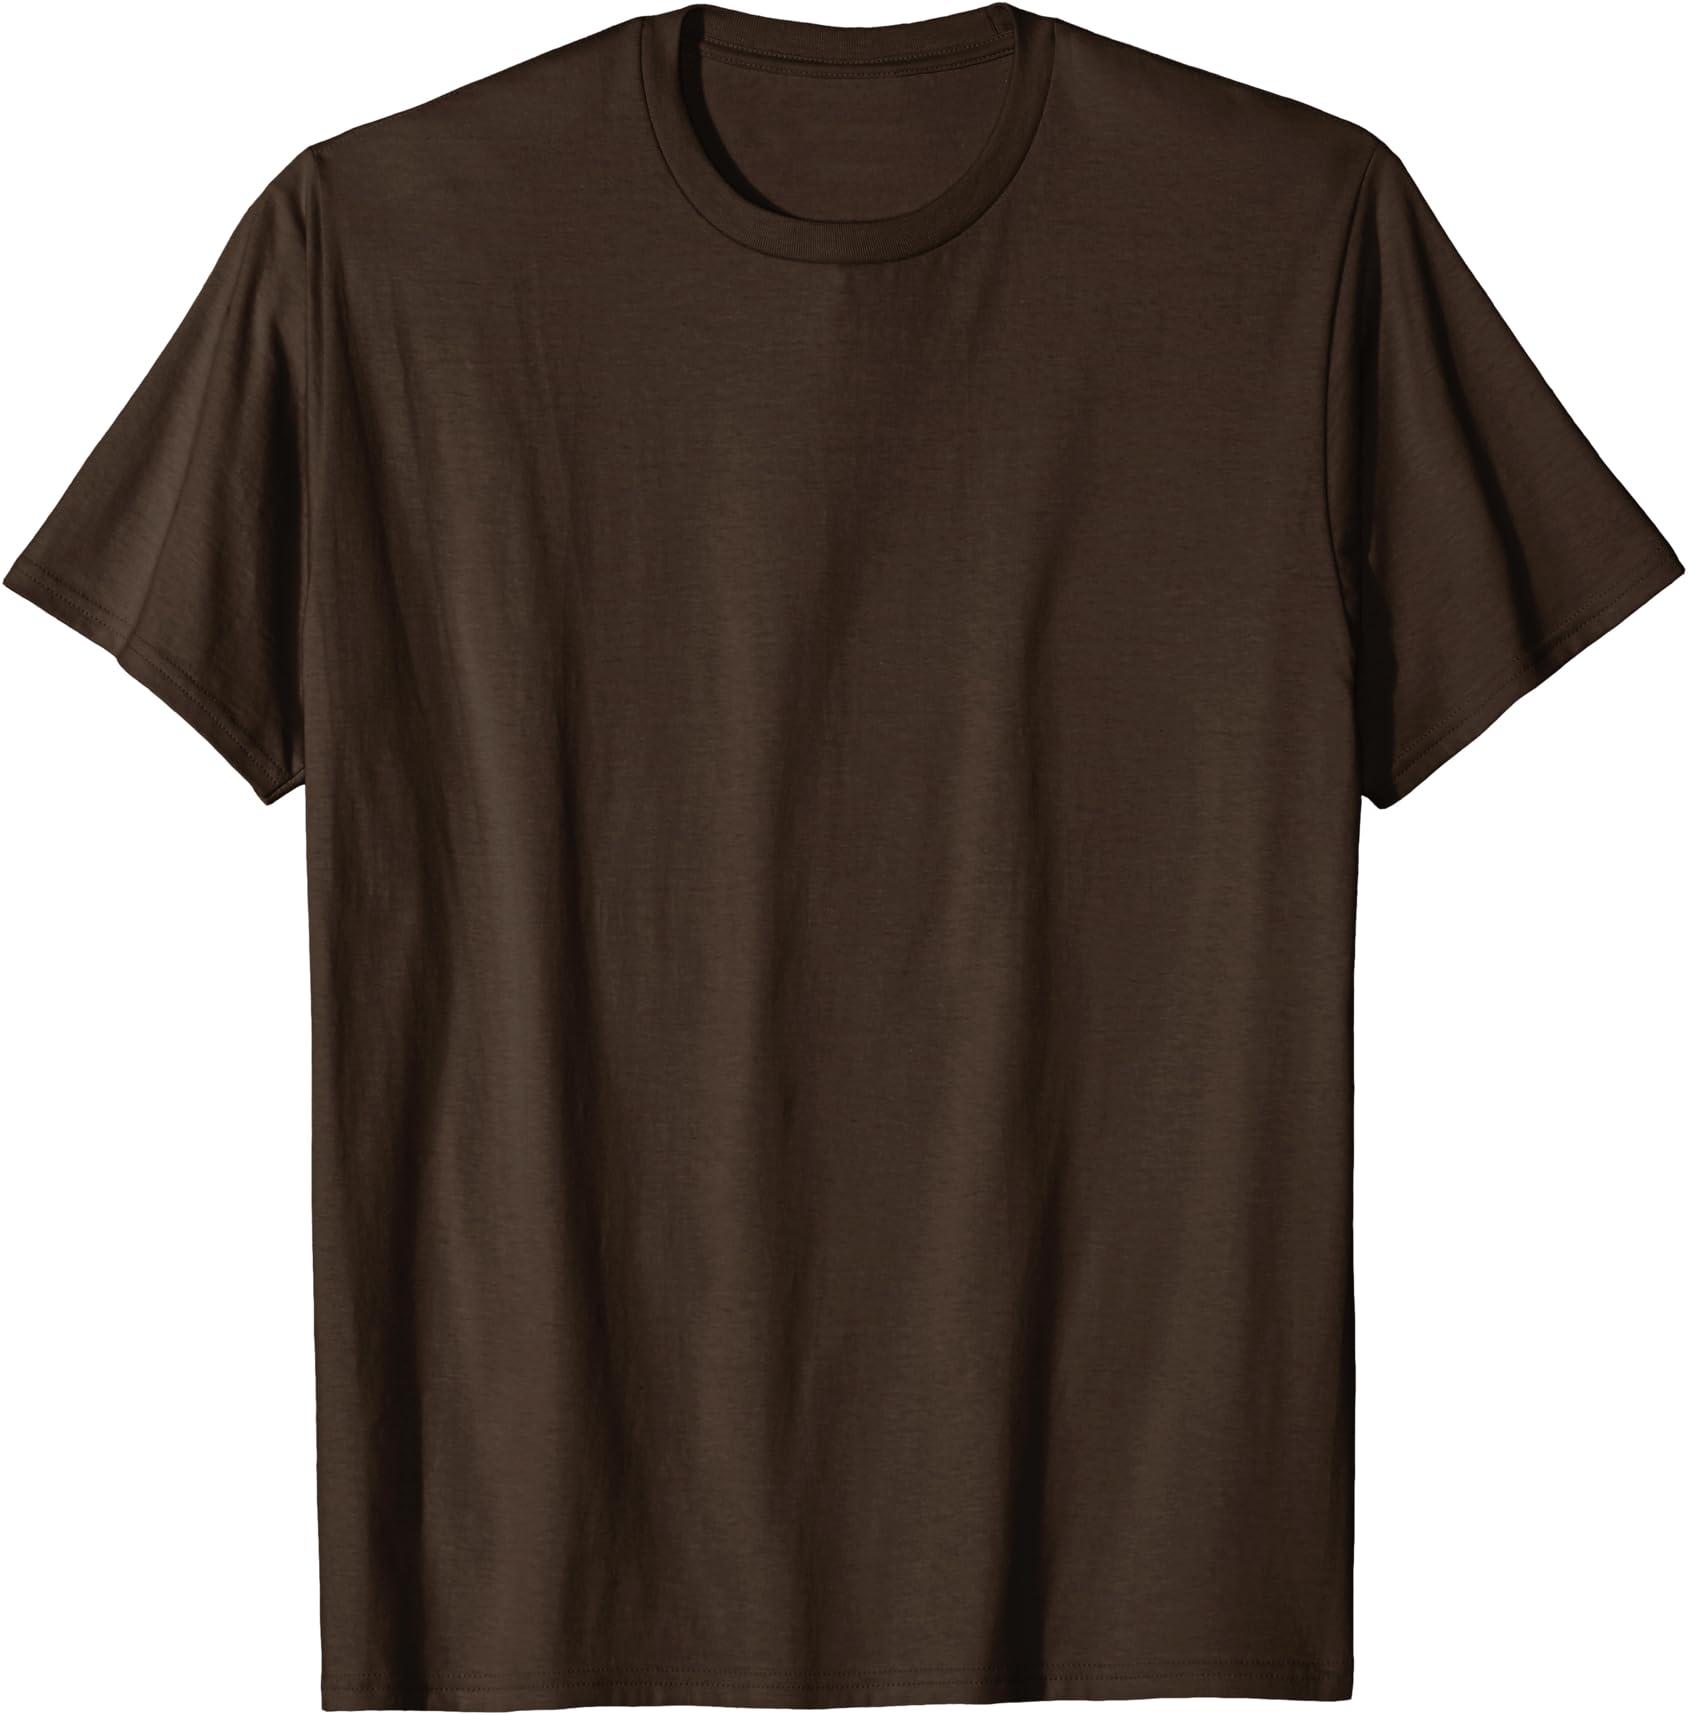 Printed T shirt tee Made in 1969 happy birthday present gift idea original